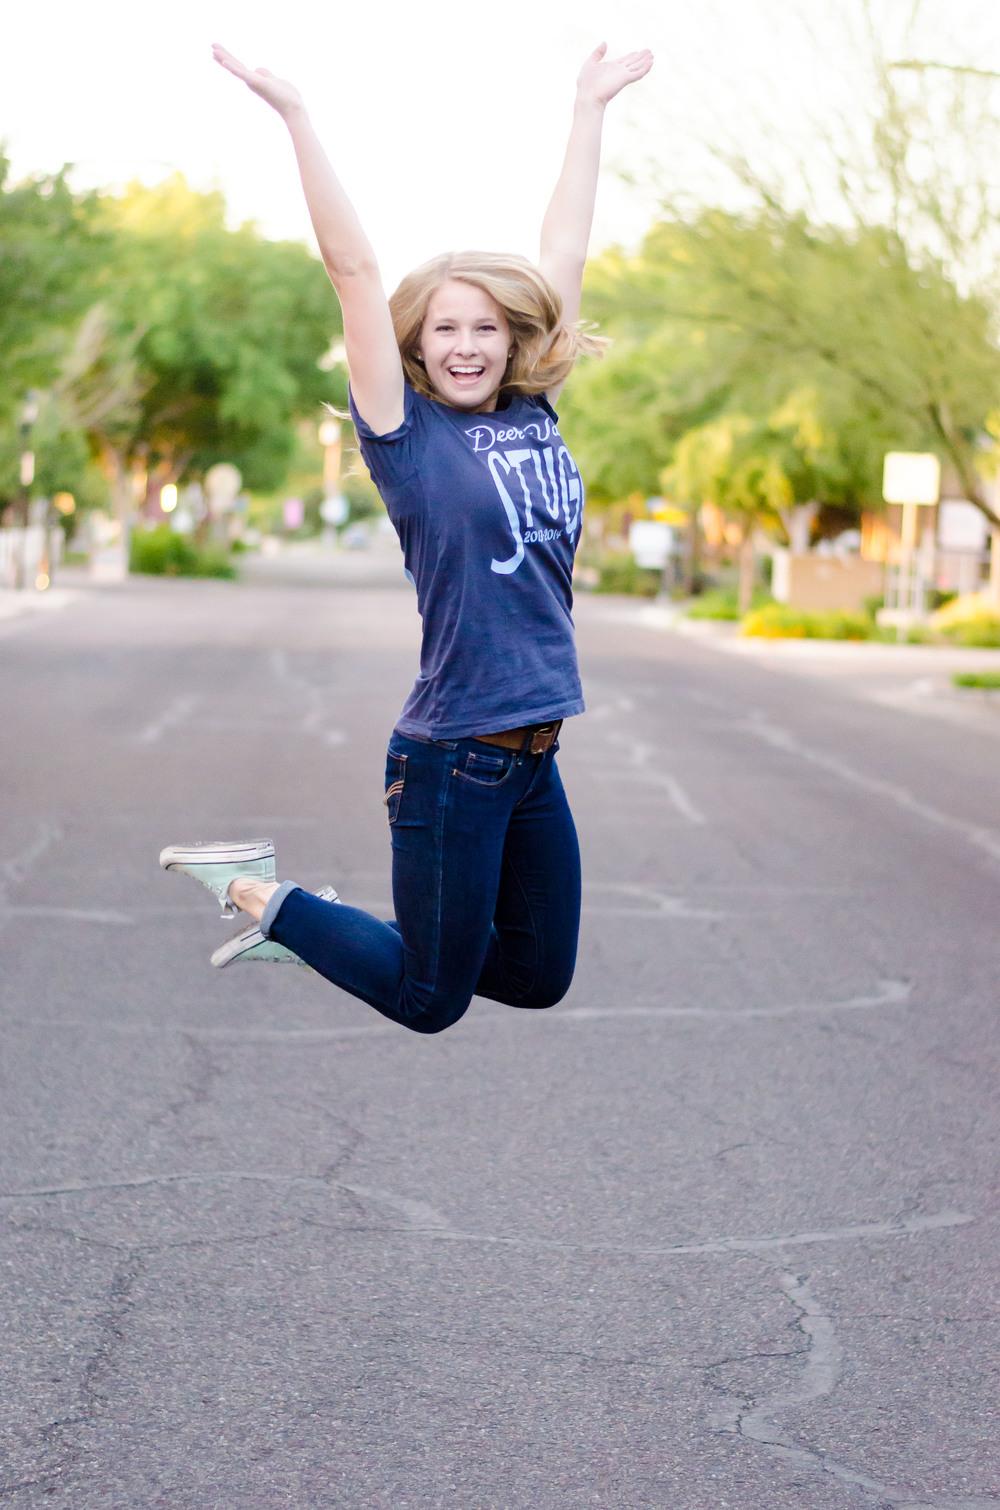 glendale arizona family photographer -03952015.jpg